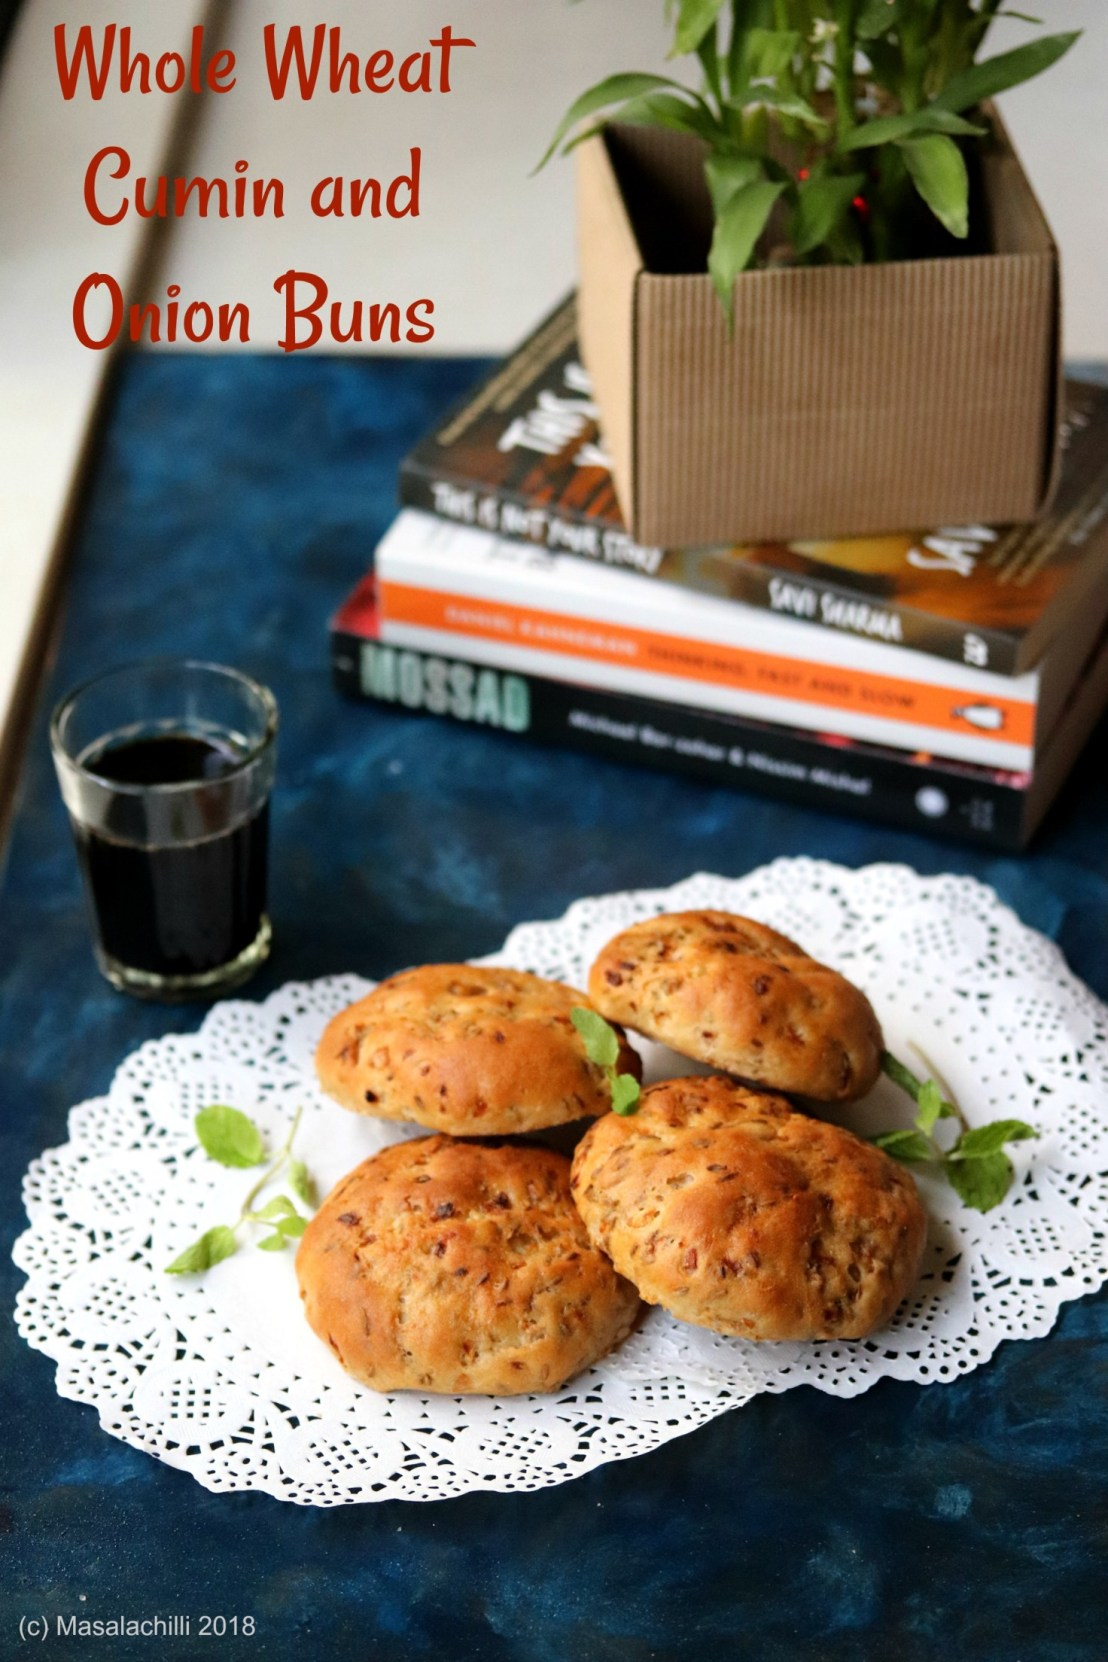 Whole-Wheat-Cumin-and-Onion-Buns-2.jpg